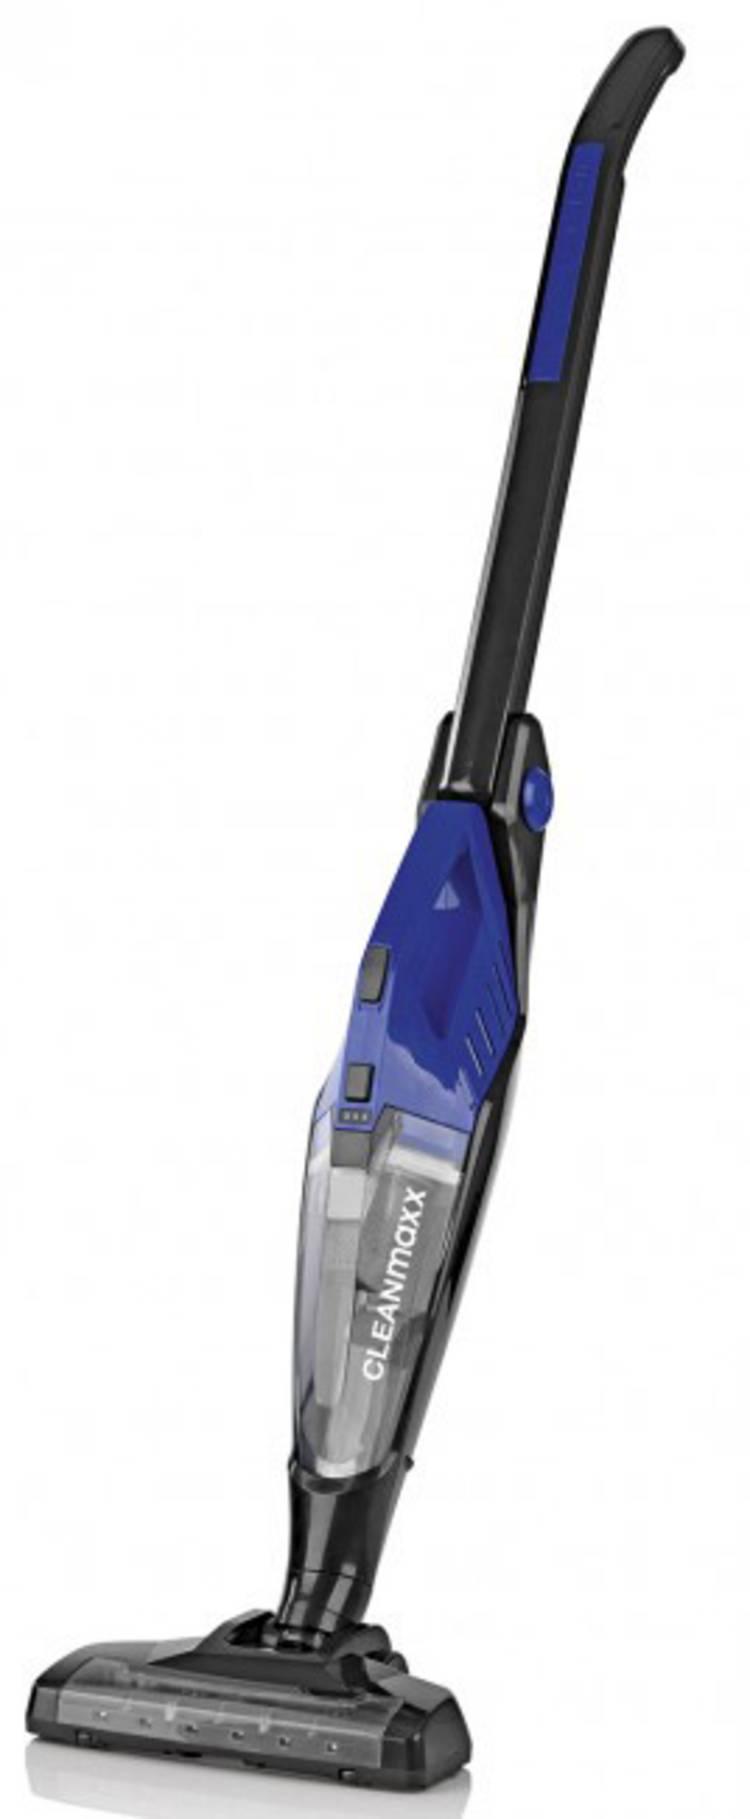 Image of Accu-handstofzuiger CleanMaxx Zwart, Blauw